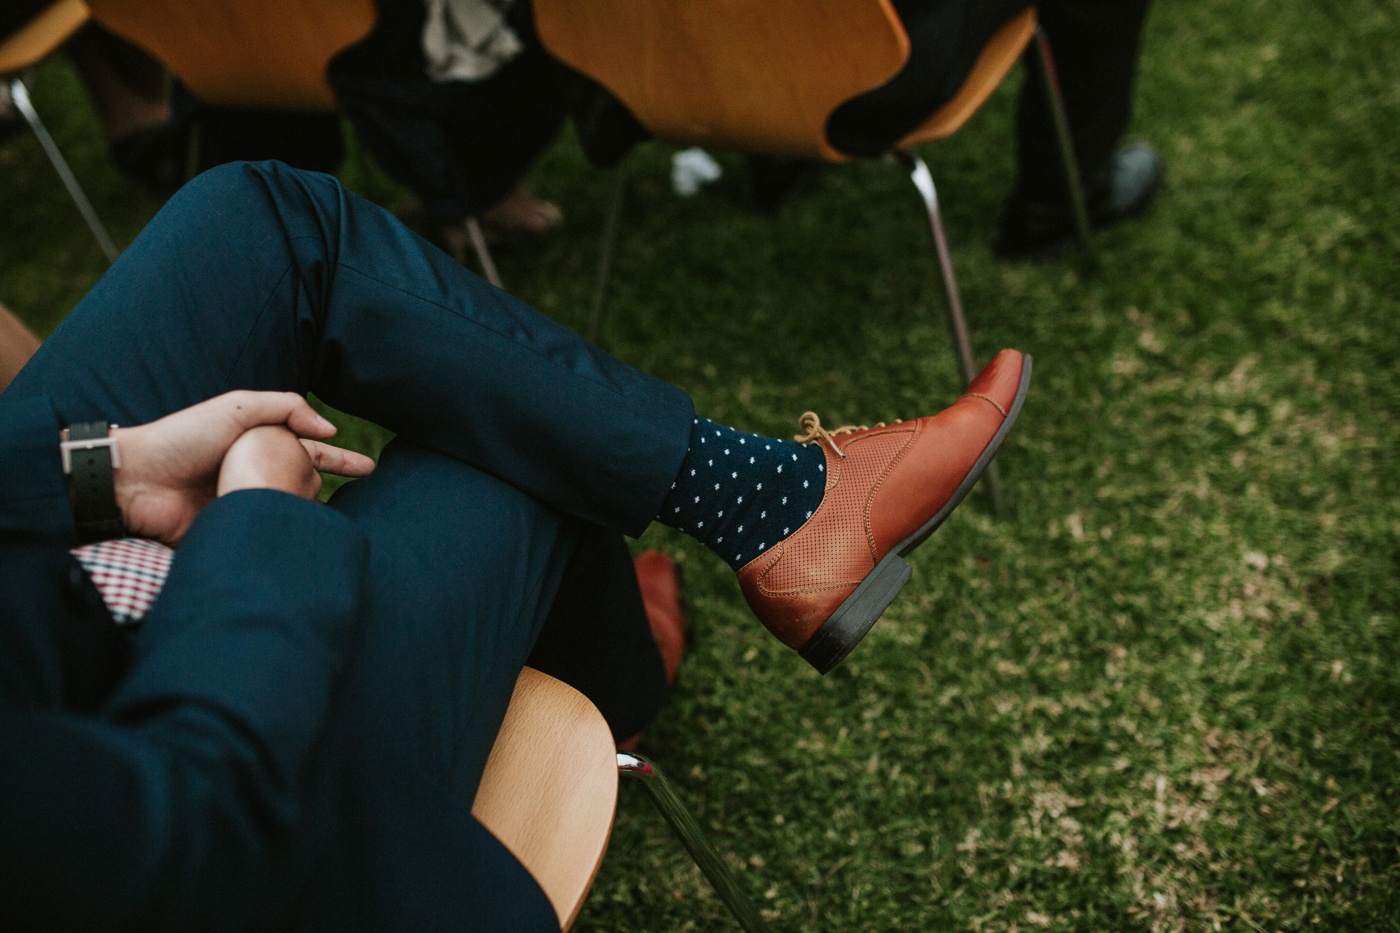 anitadaniel_melbourne-scienceworks-relaxed-fun-geek-wedding_melbourne-candid-wedding-photography_44